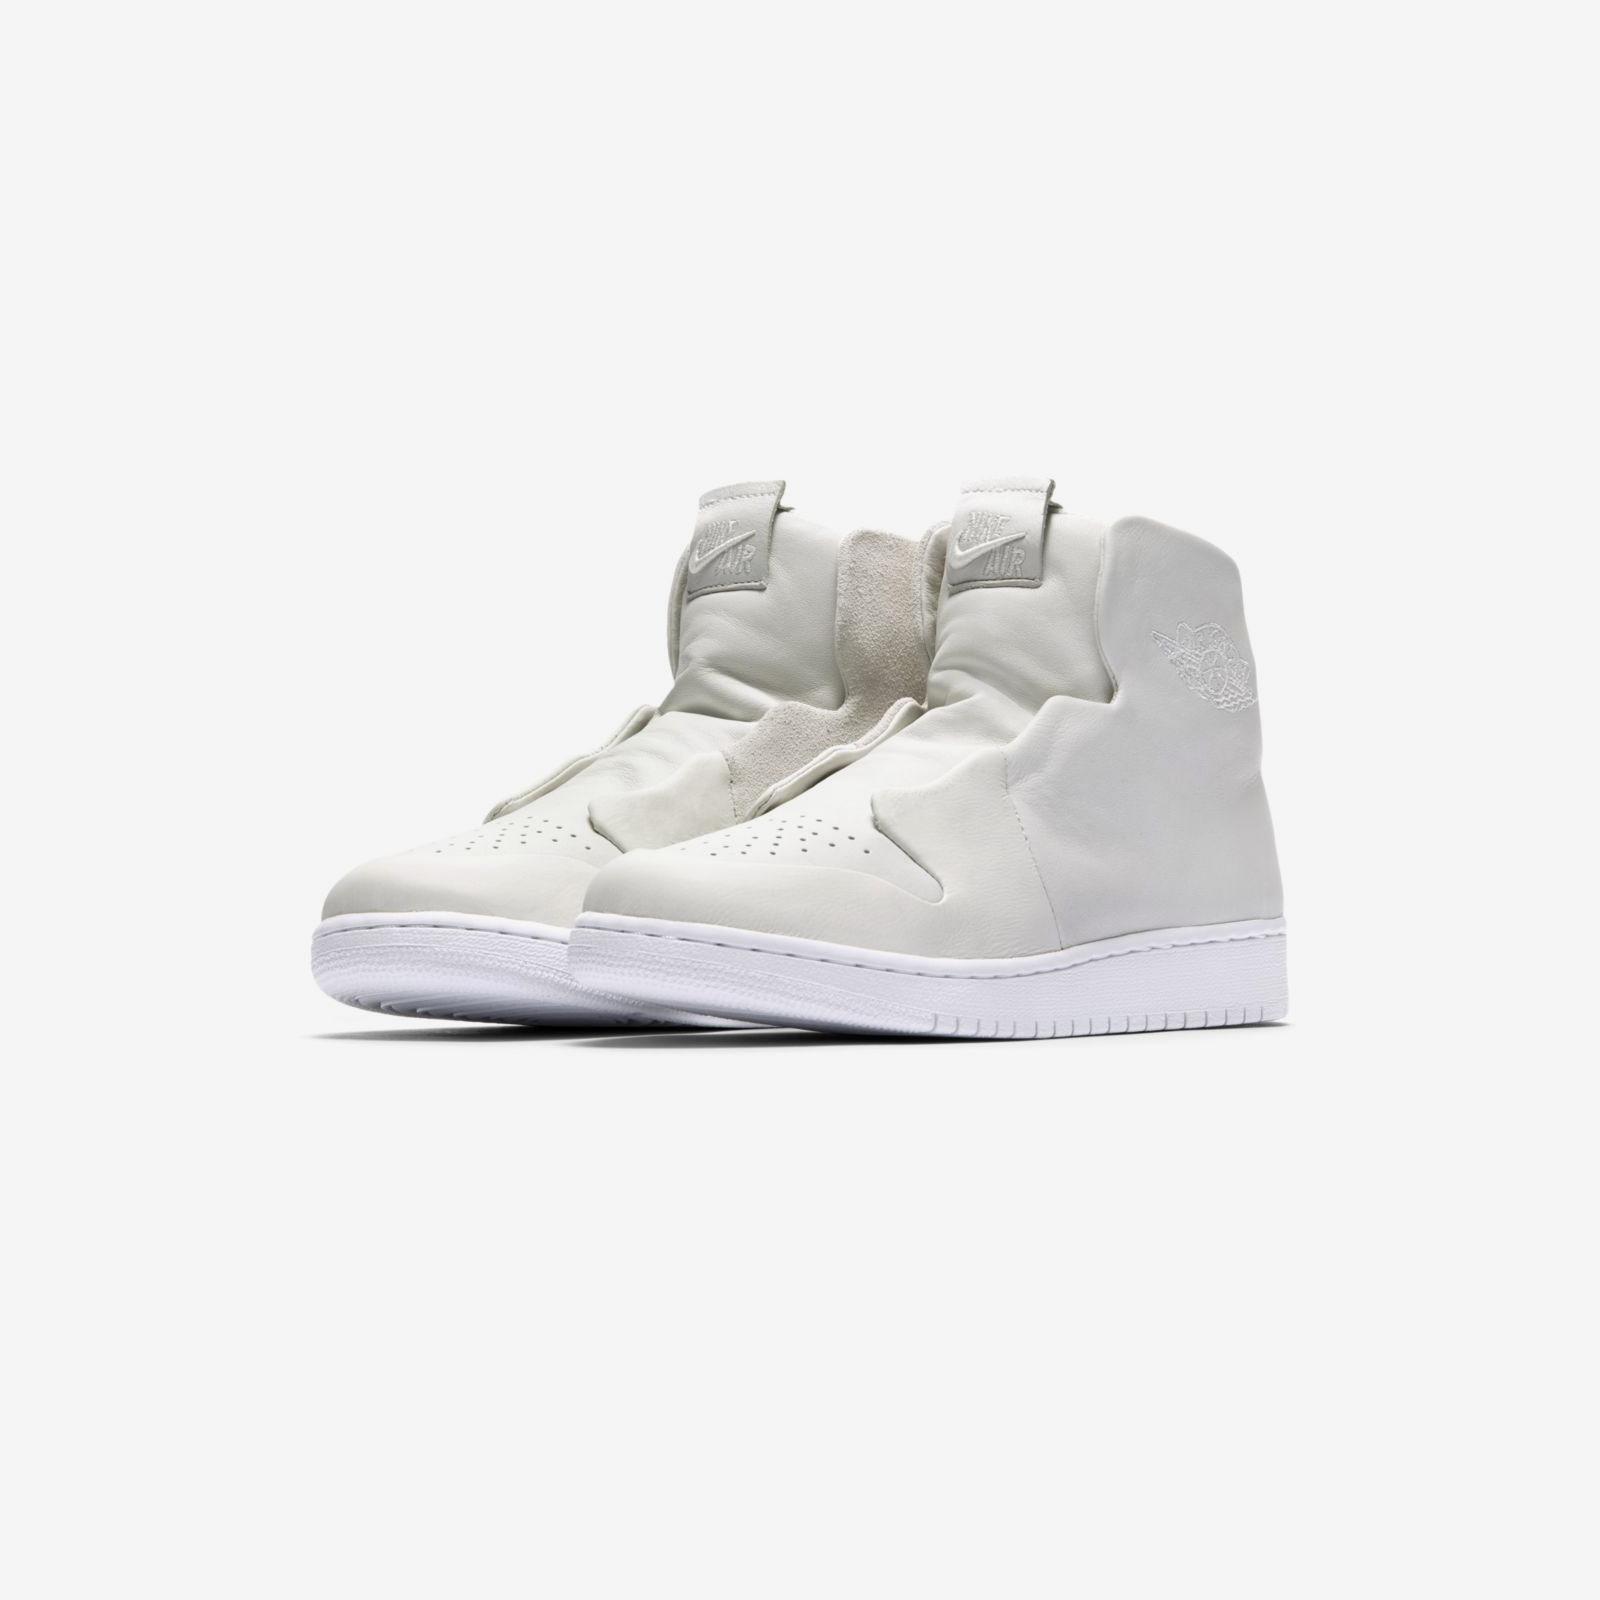 buy popular d7c64 9d821 Jordan Brand Air Jordan 1 Sage XX THE 1, REIMAGINED